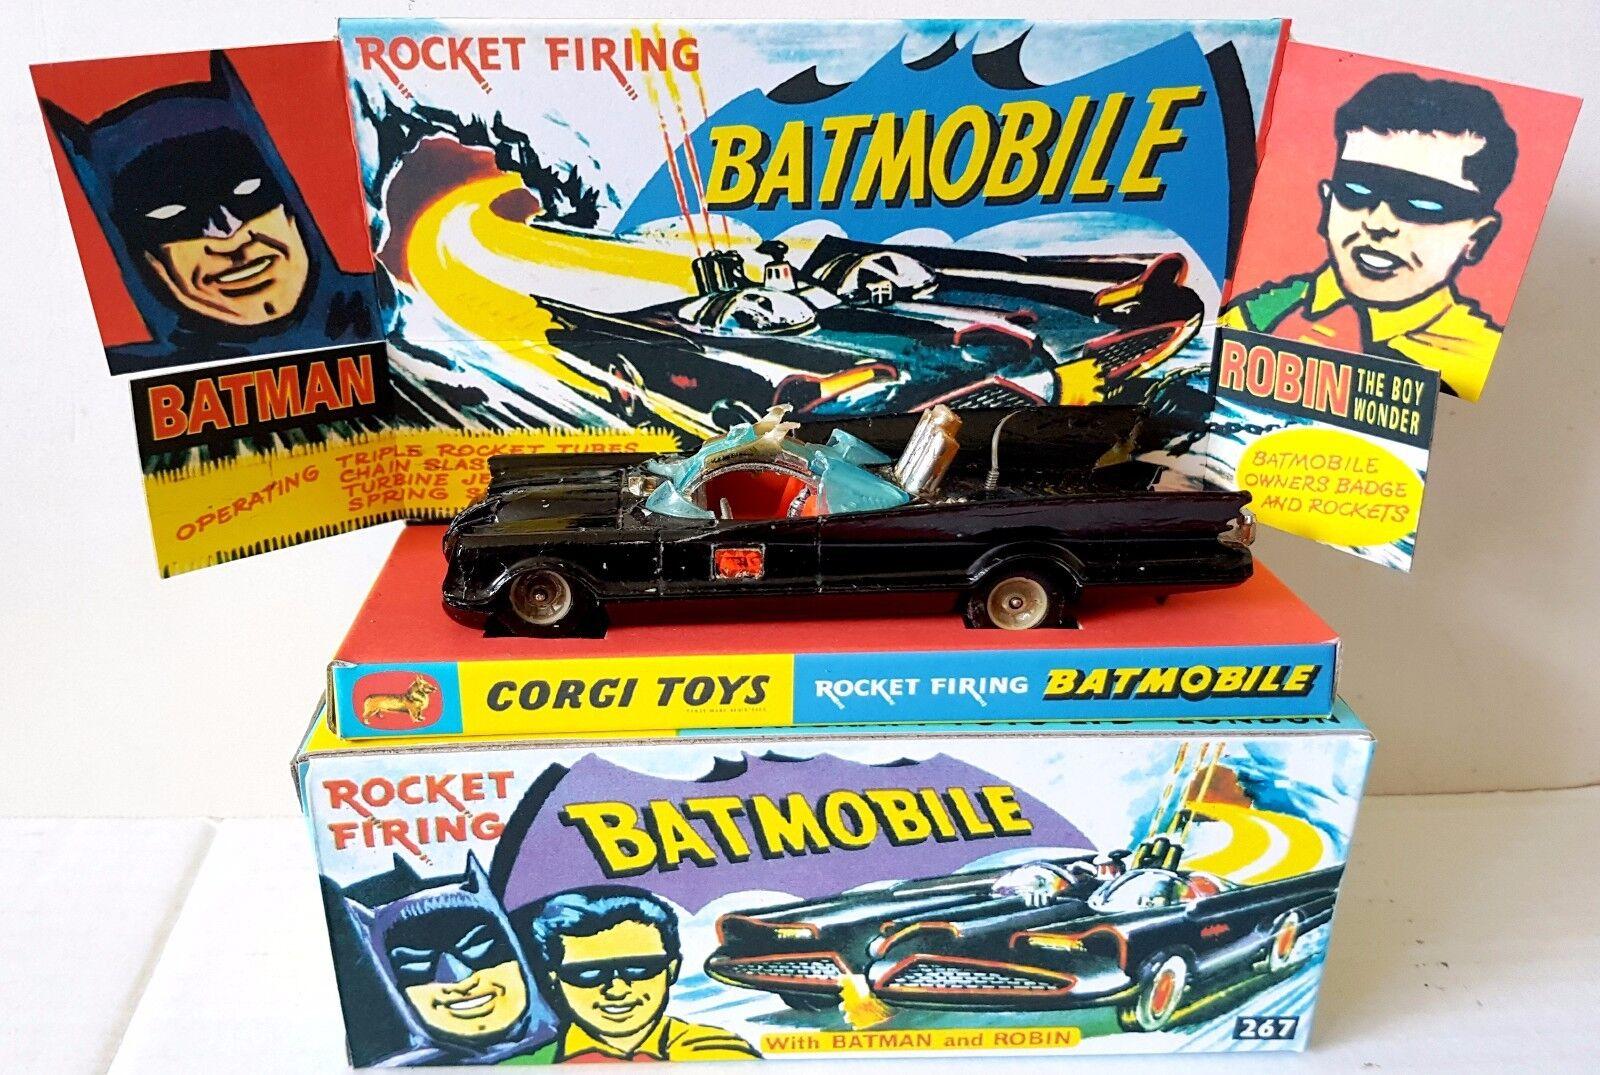 Corgi spielzeug batman 267 batmobil ein diecast modell auto & repro - box sockel + extras [i